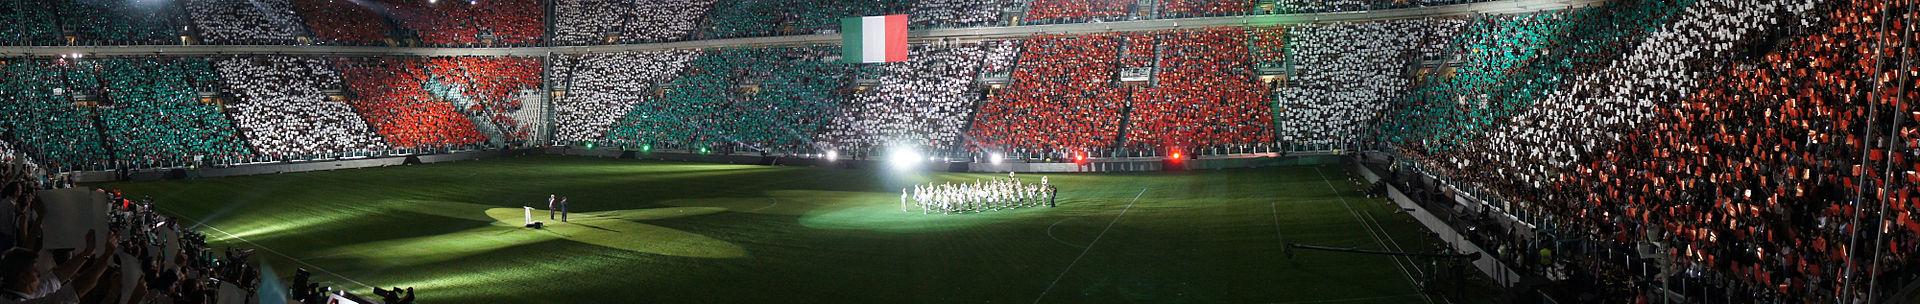 Juventus_Stadium_inauguration